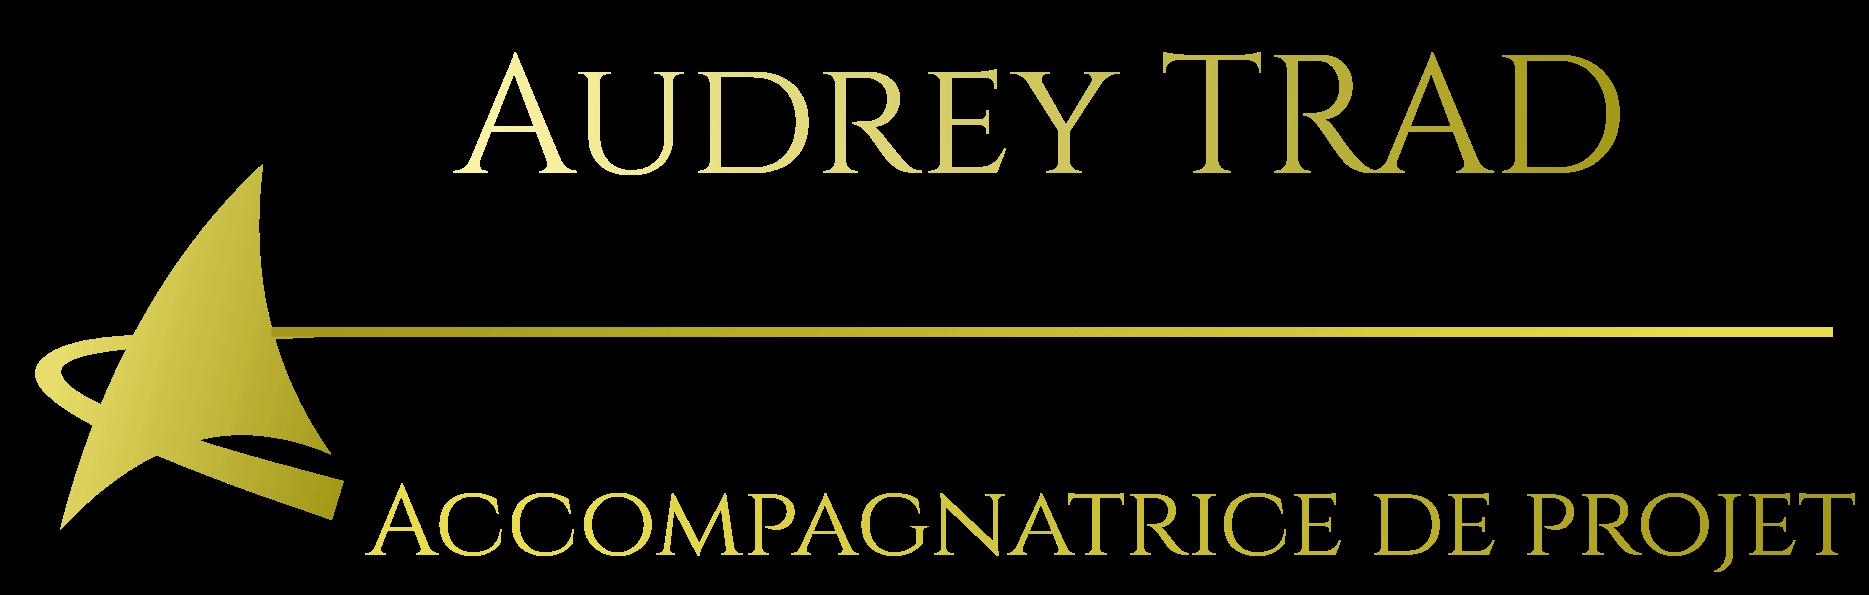 Audrey Trad